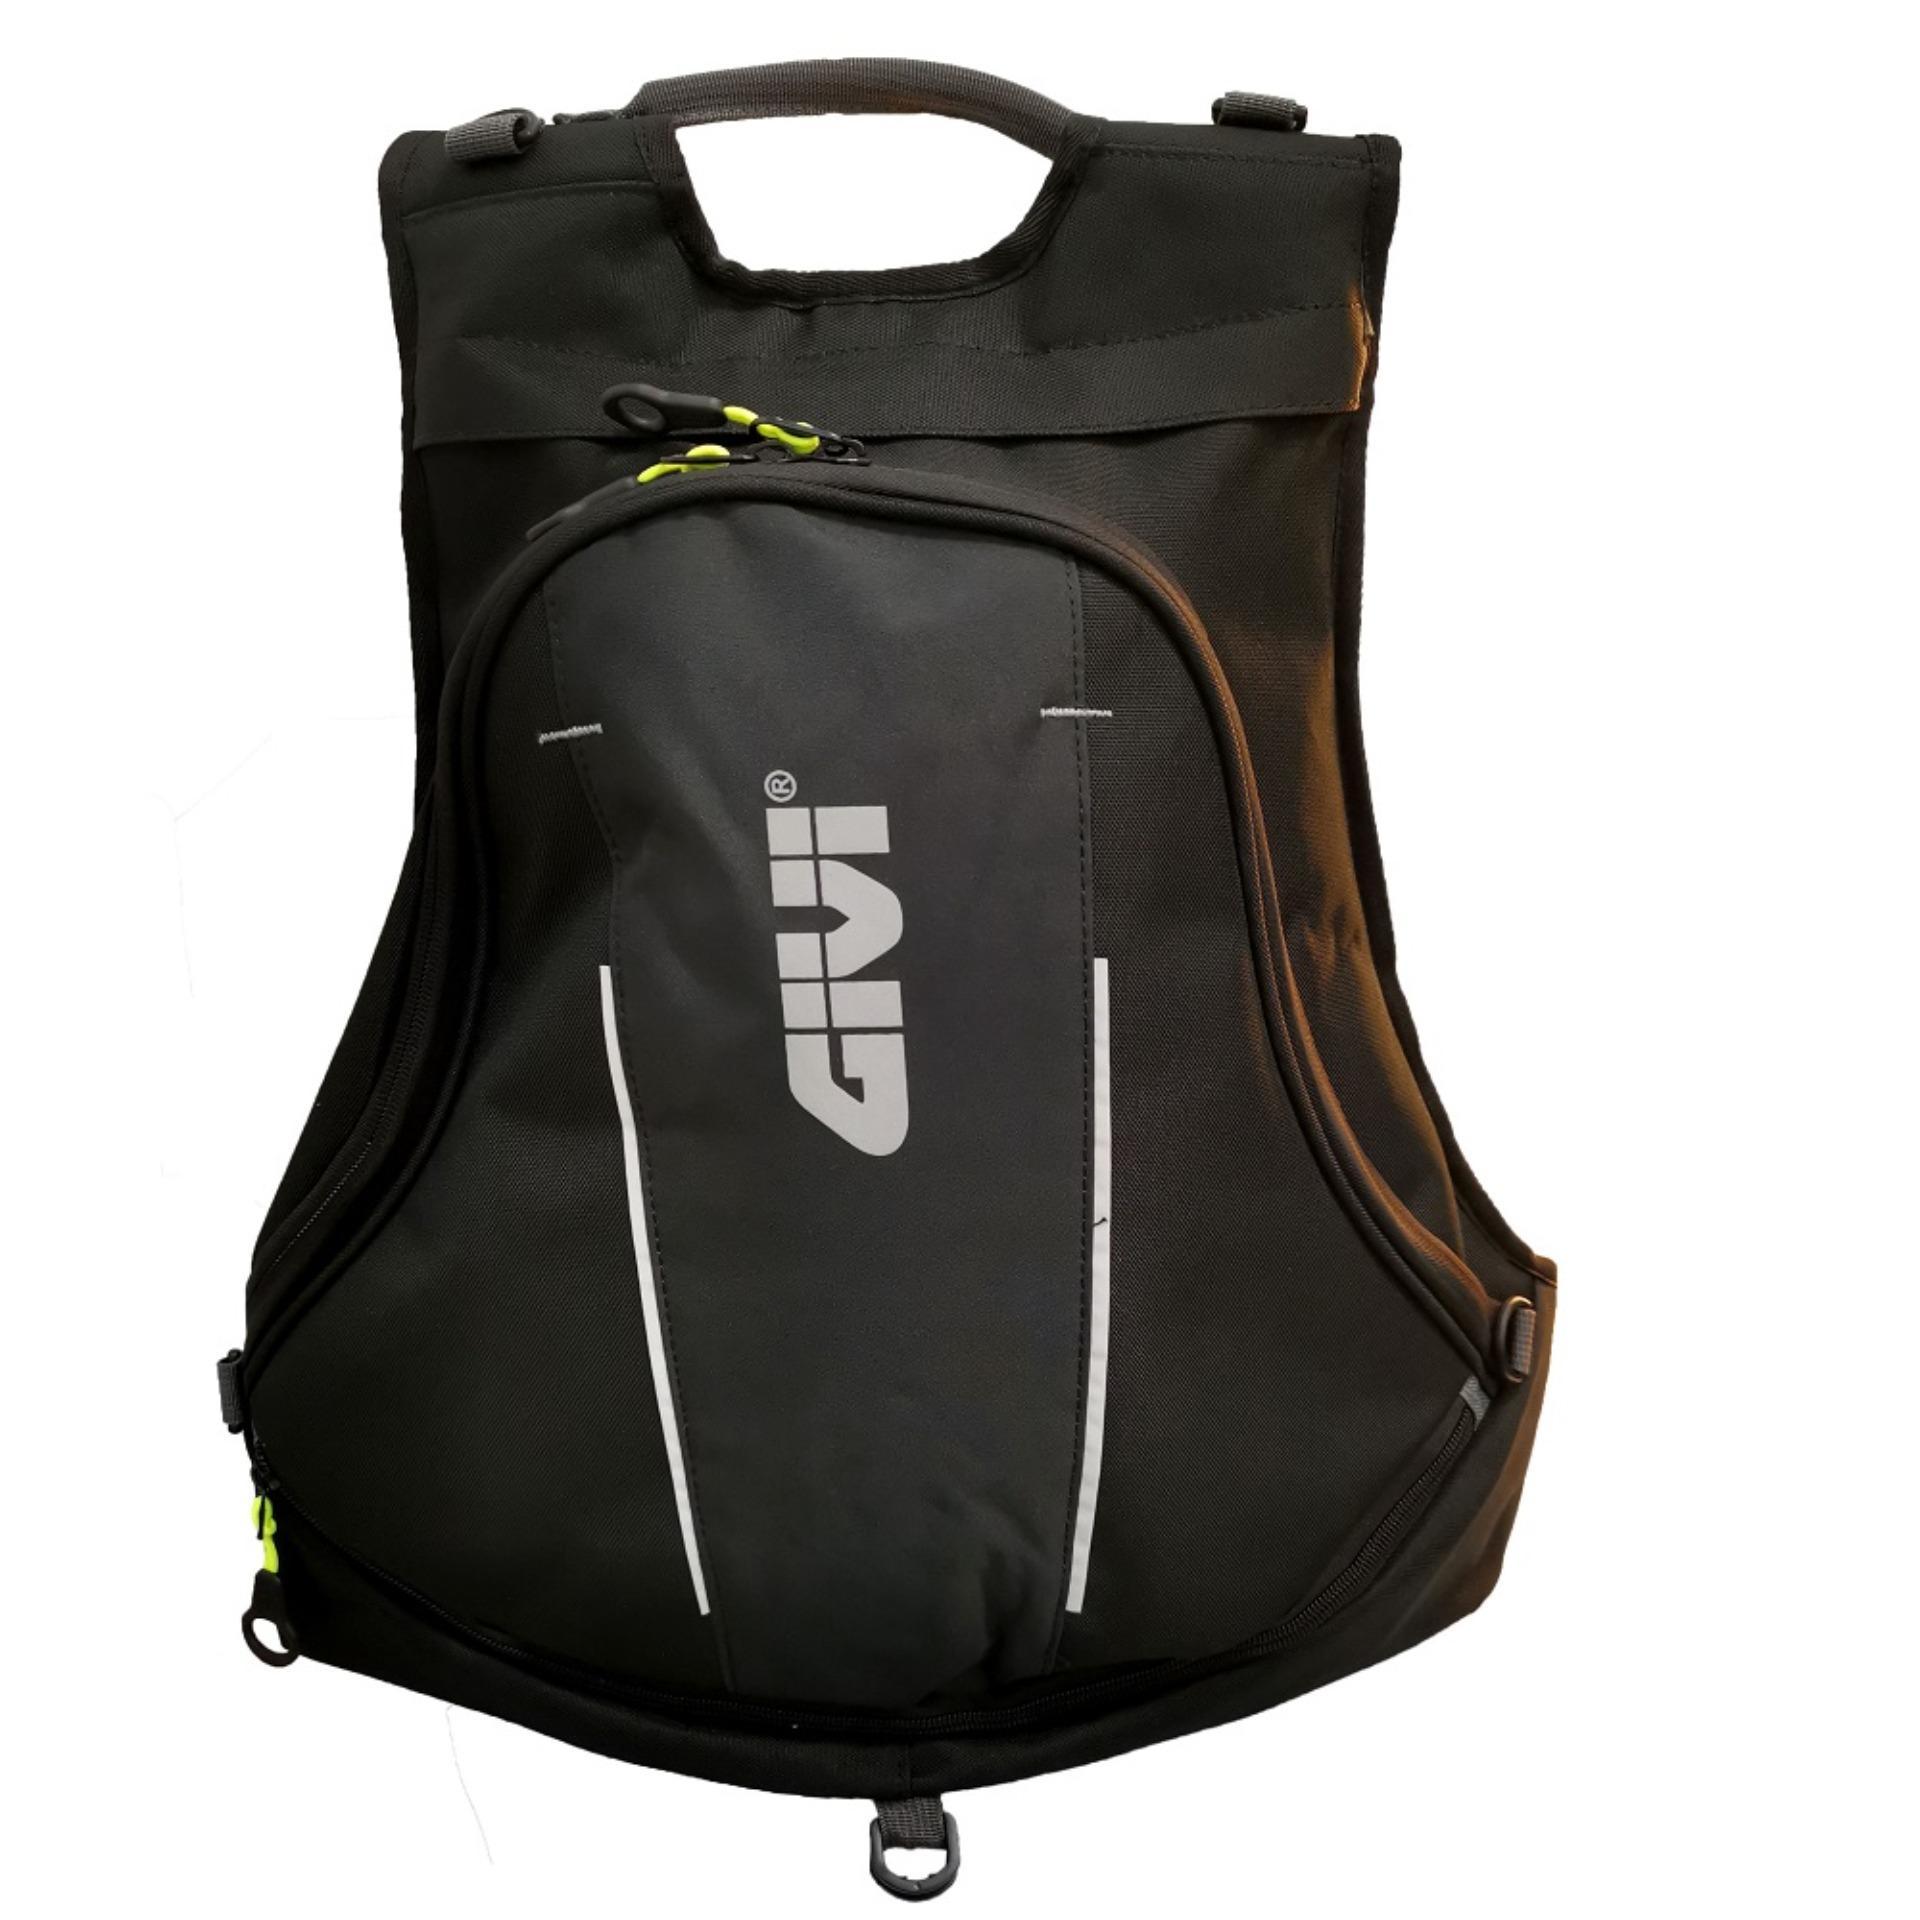 53f4df566bc GIVI Philippines: GIVI price list - GIVI Topbox, Side Bag & Padlock ...